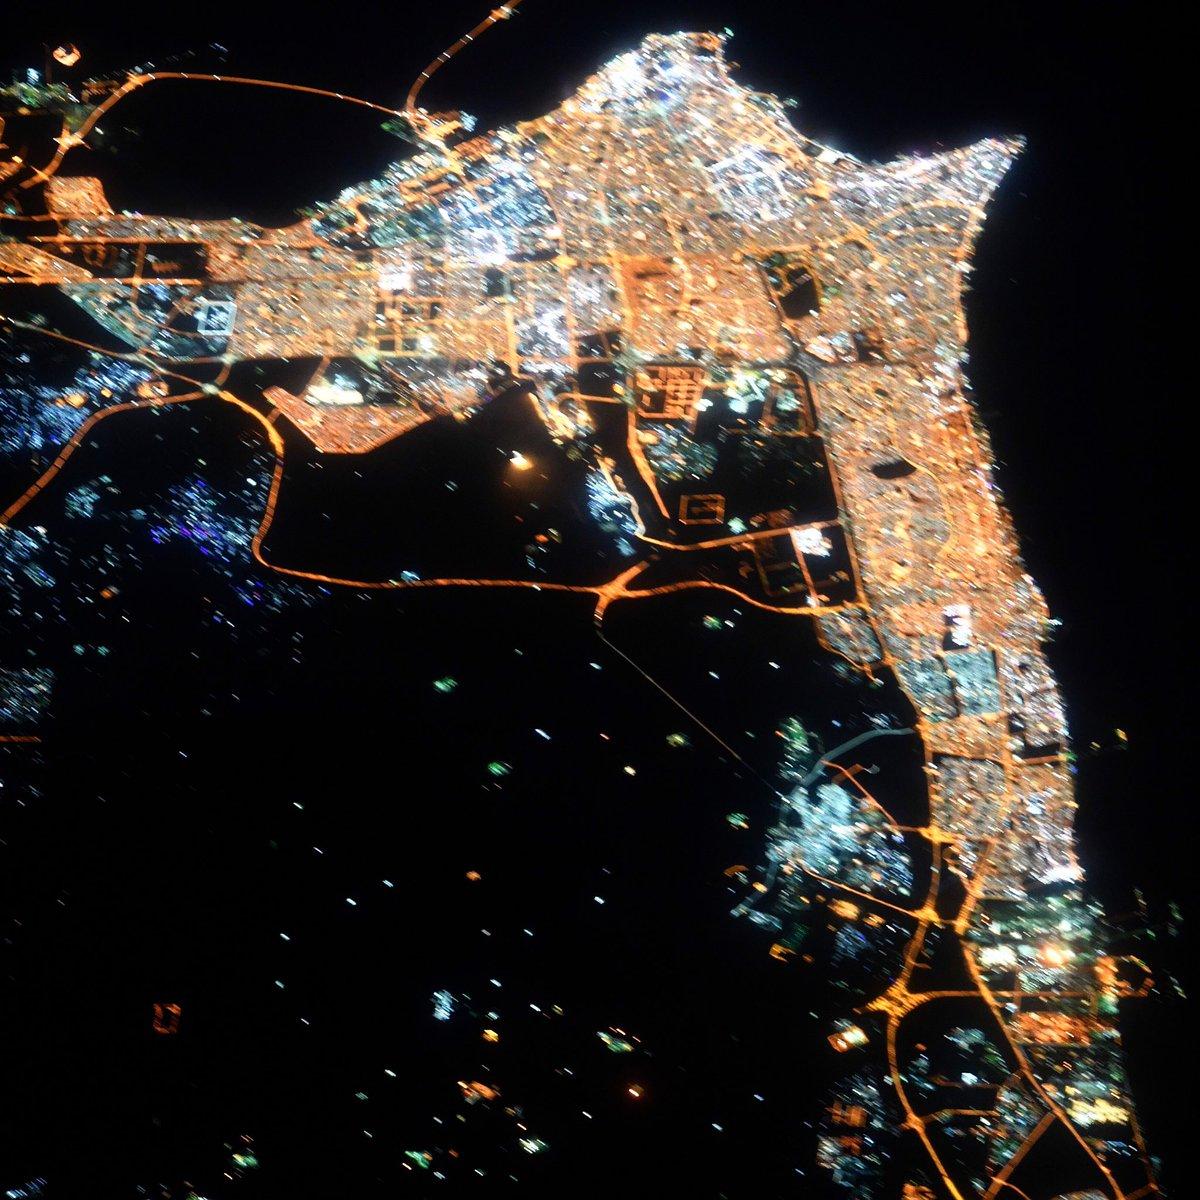 Like a diamond sparkling on the Persian Gulf - goodnight Kuwait City! #GoodnightFromSpace